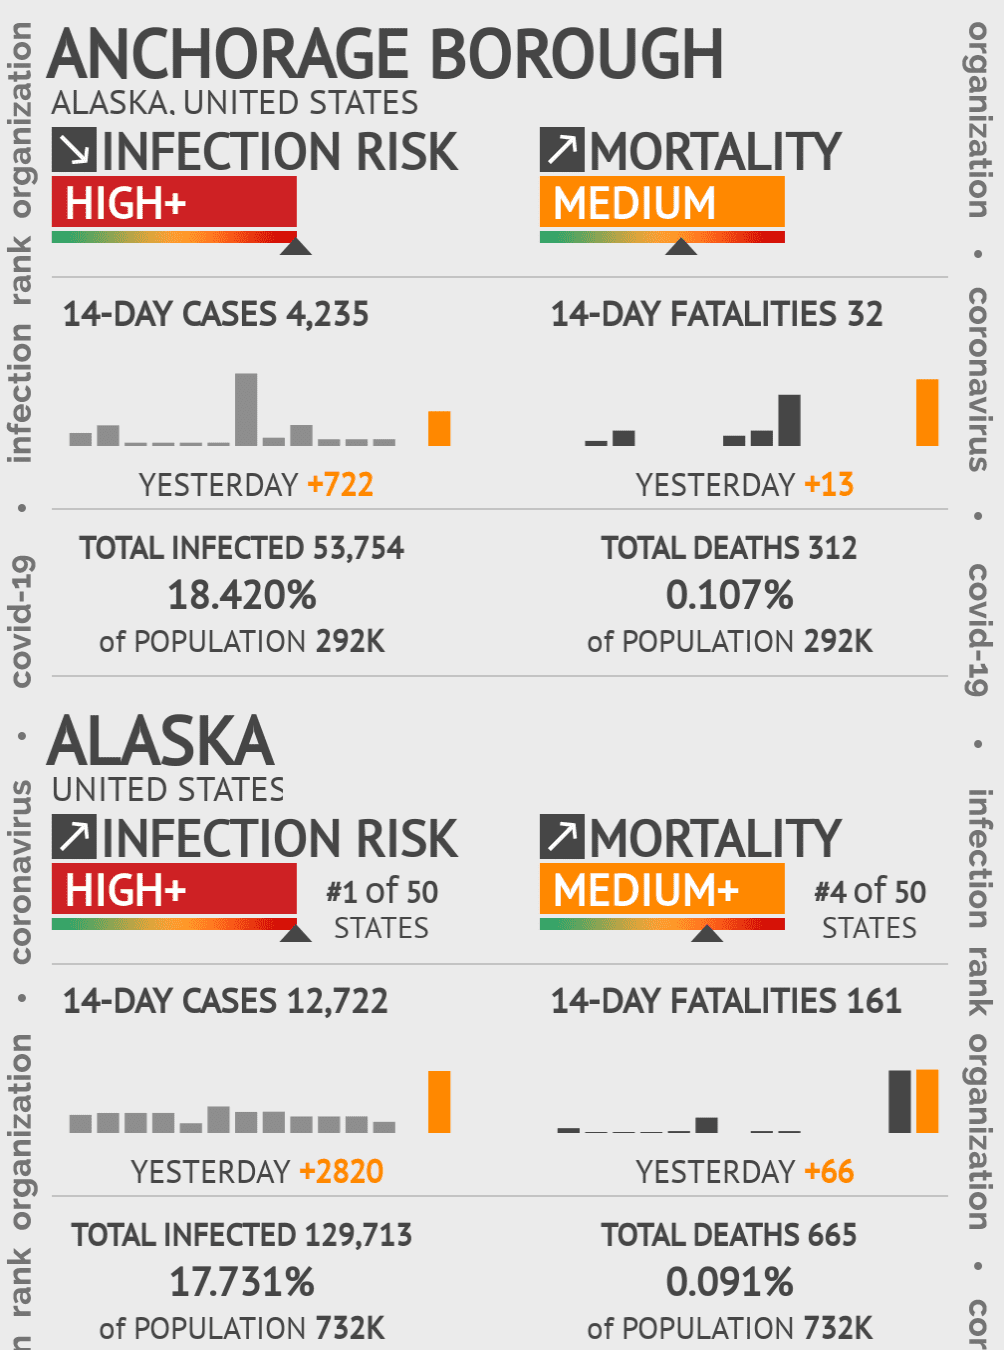 Anchorage Borough Coronavirus Covid-19 Risk of Infection on March 06, 2021